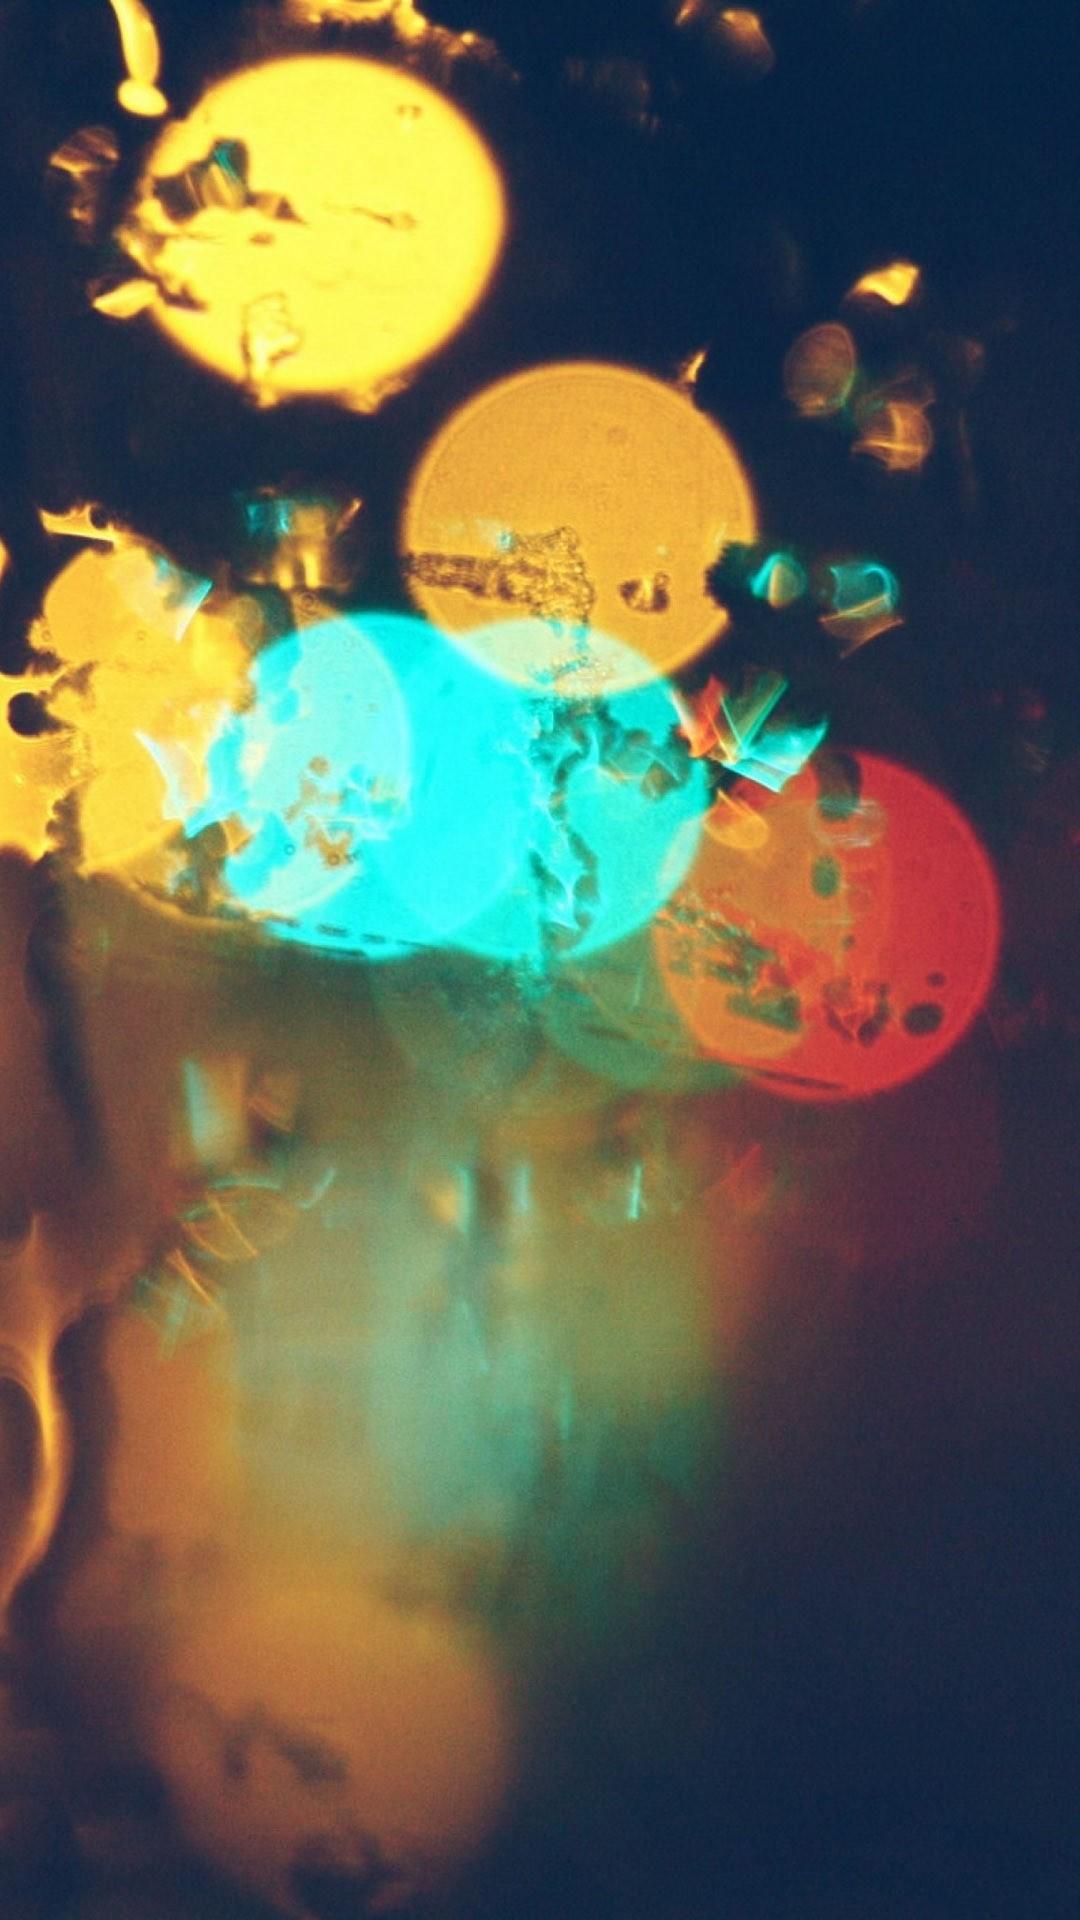 1080x1920 City Lights Bokeh Rain Glass IPhone 7 Plus HD Wallpaper